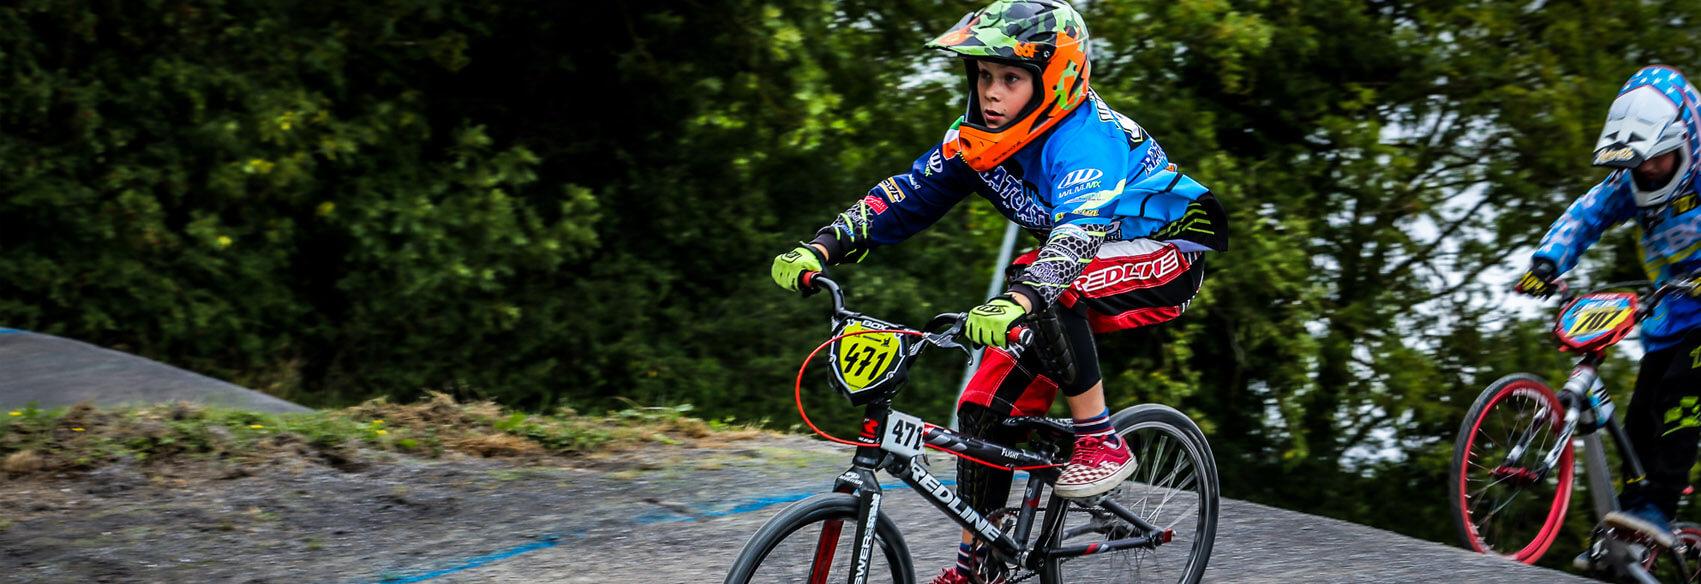 Josh Whitley Halvey Irish Rider Profiles - Fifteen BMX